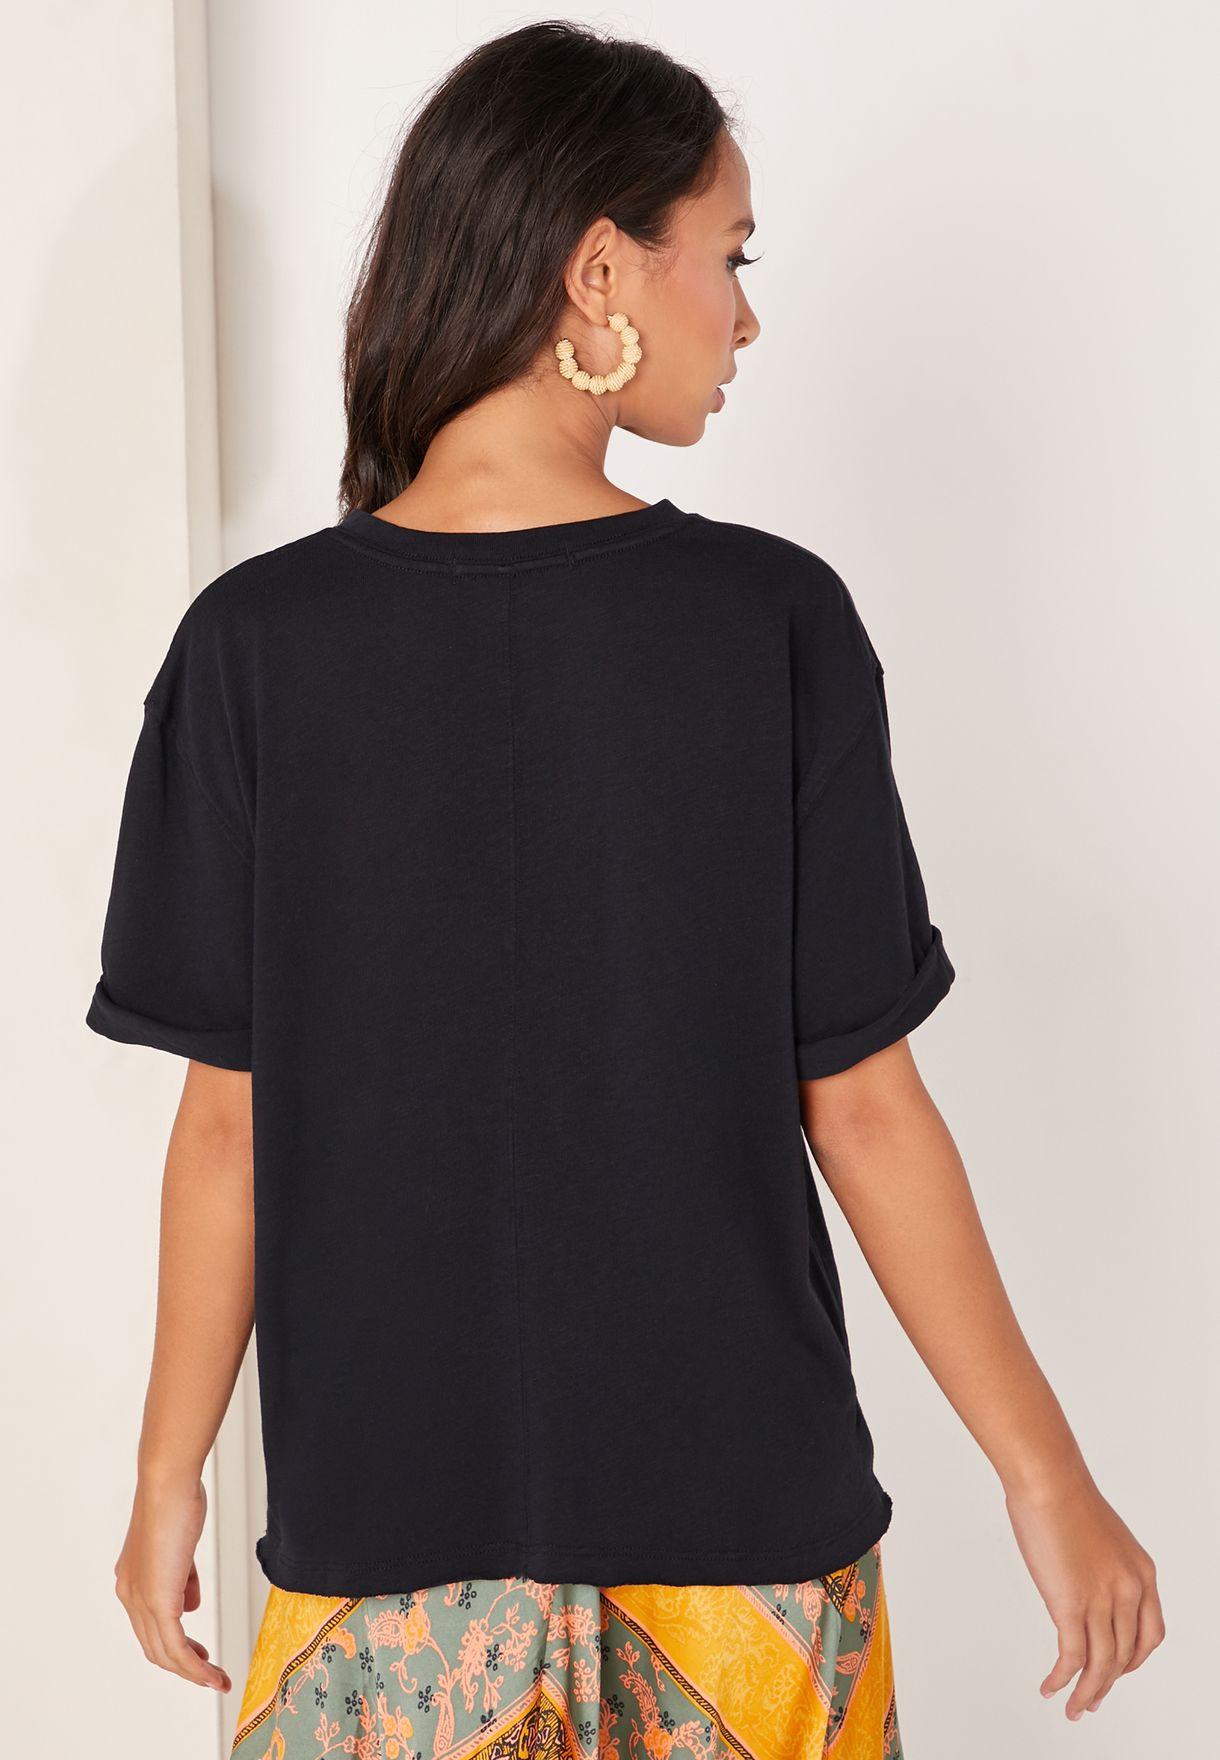 Cassidy Crew Neck Textured T-Shirt